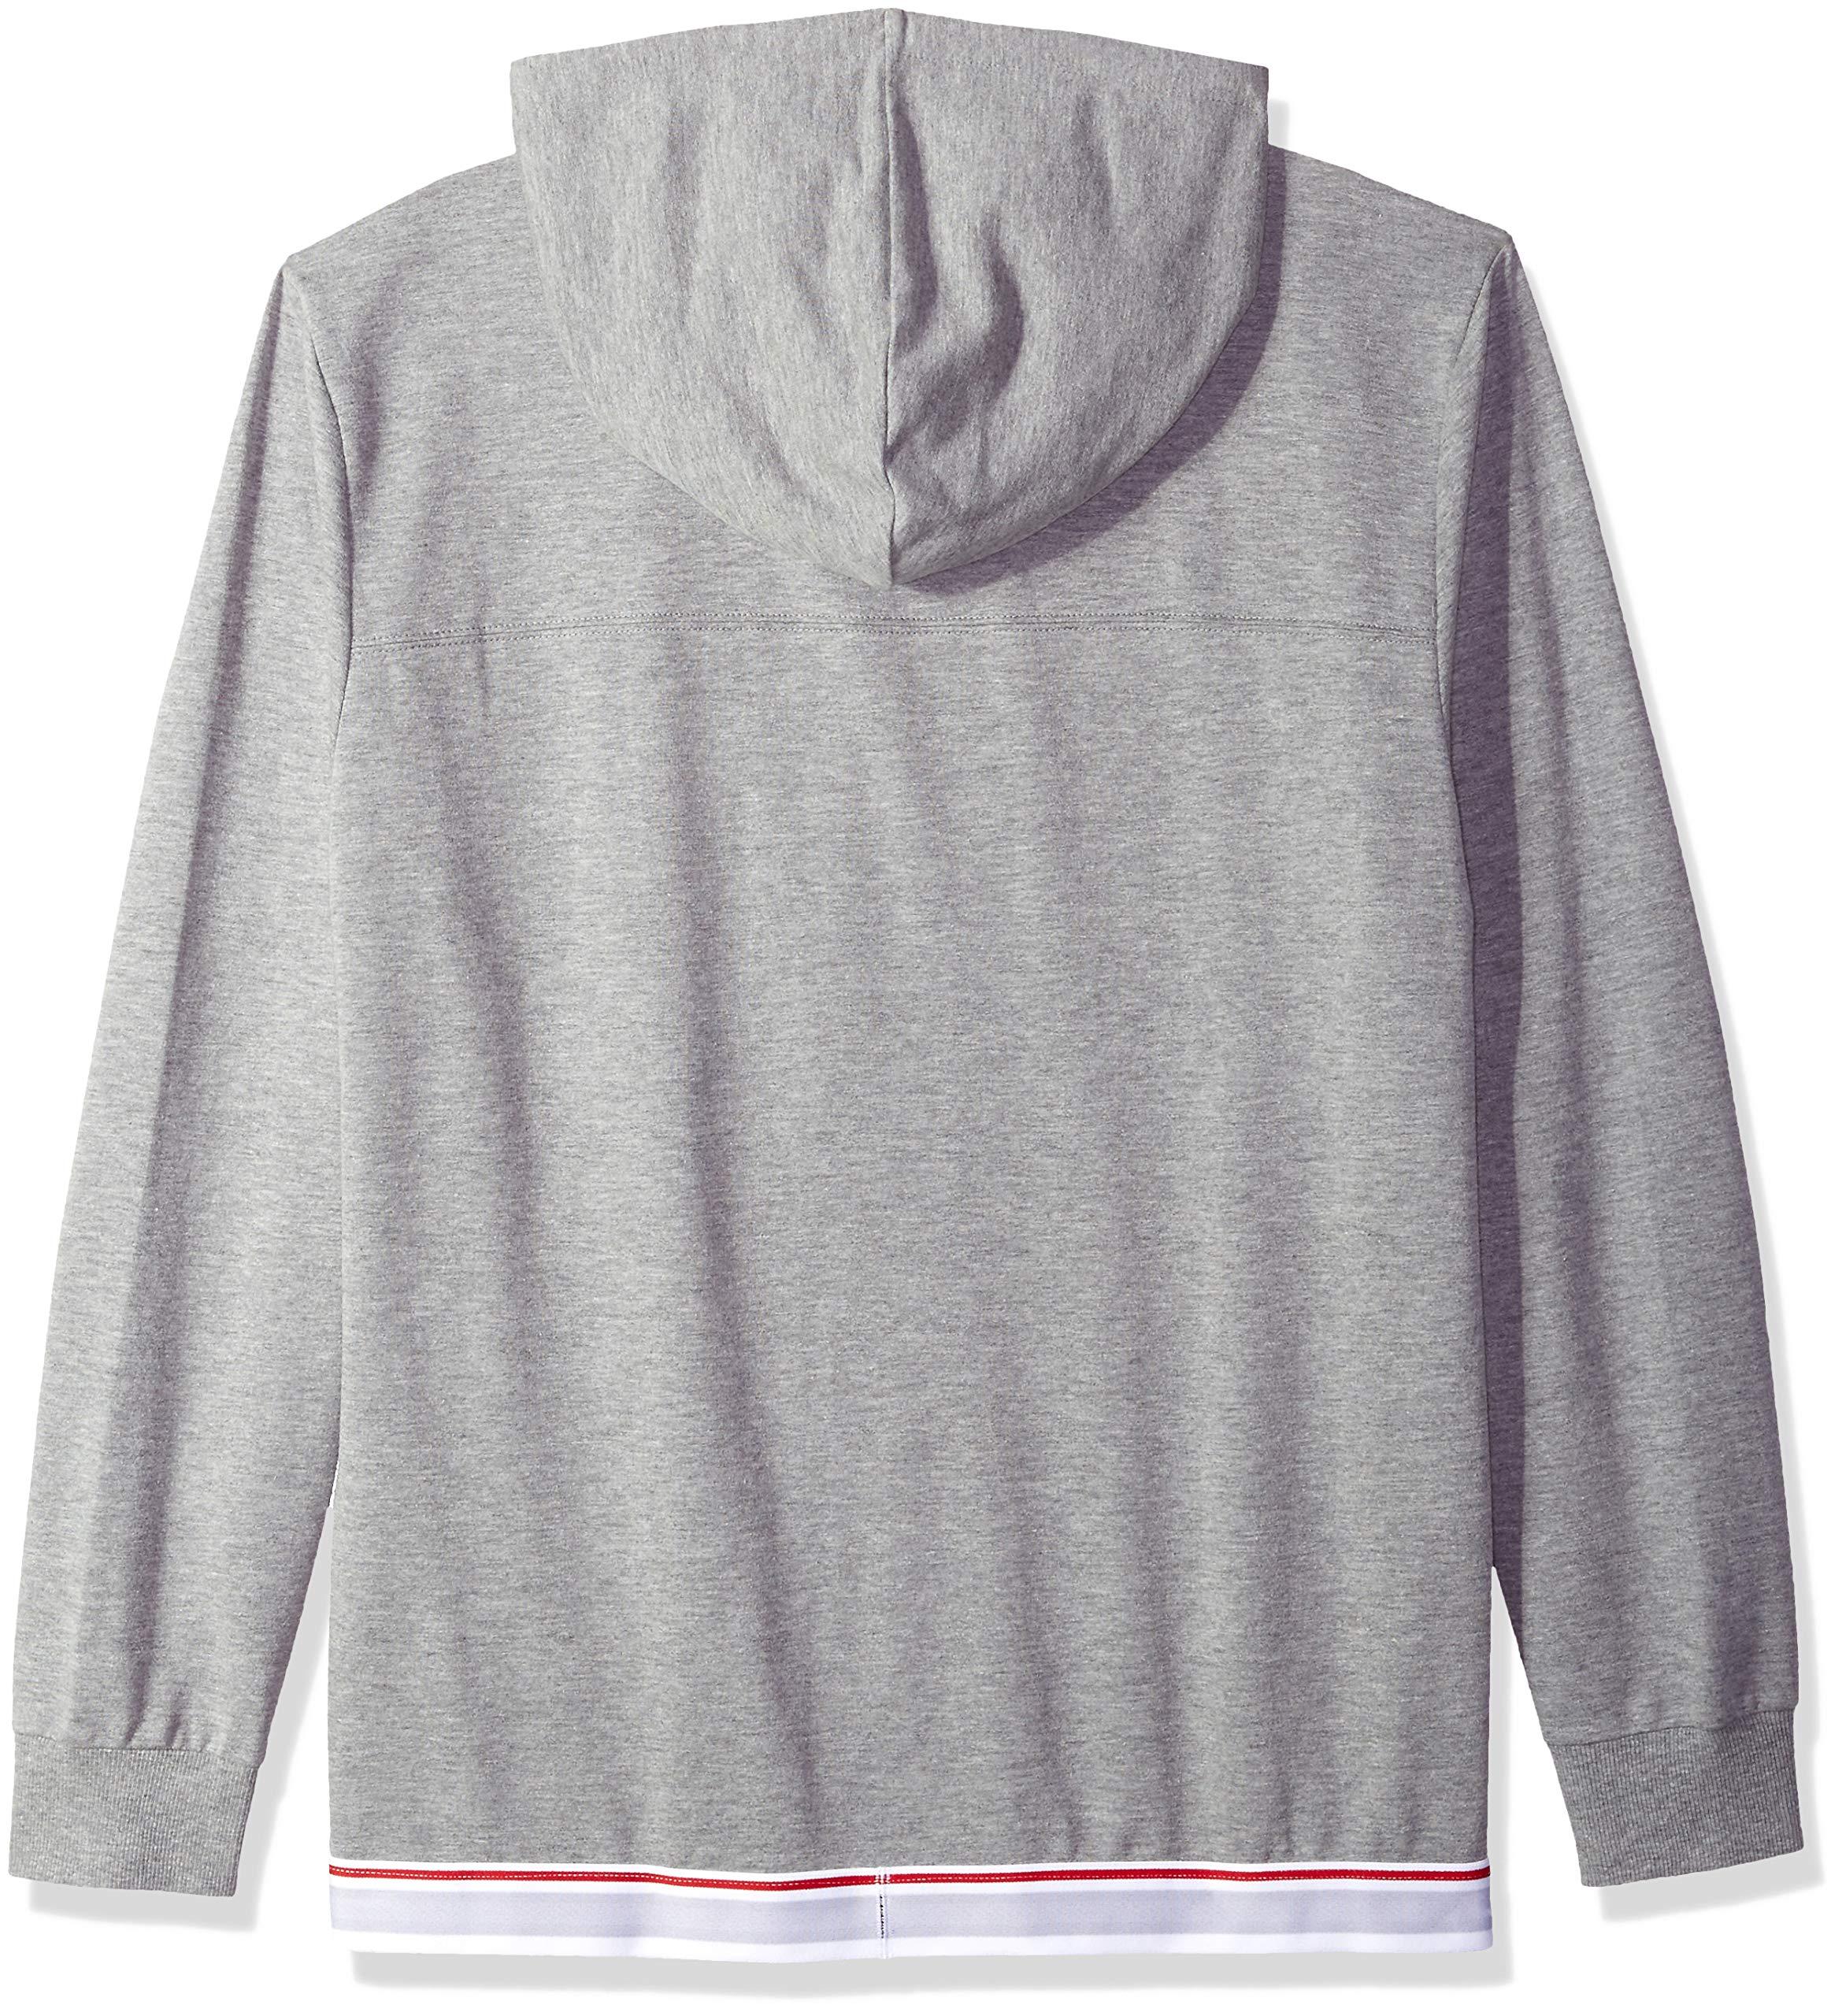 032845f91 Camisetas termicas para nios